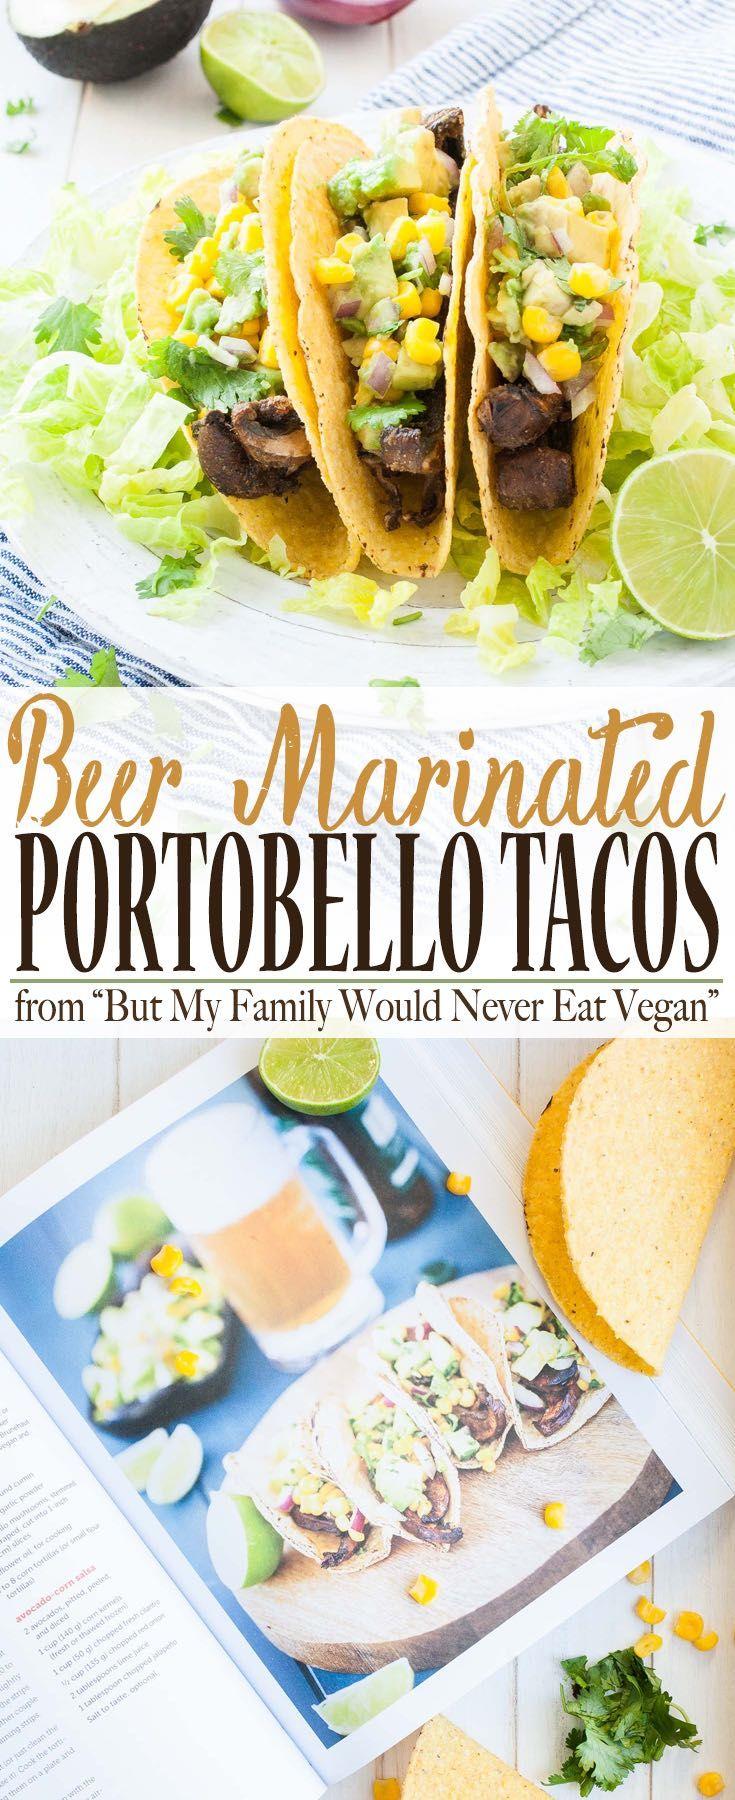 Beer-Marinated Portobello Mushroom Tacos   www.veggiesdontbite   #vegan #plantbased #glutenfree #BMFWNEVcookbook via @veggiesdontbite